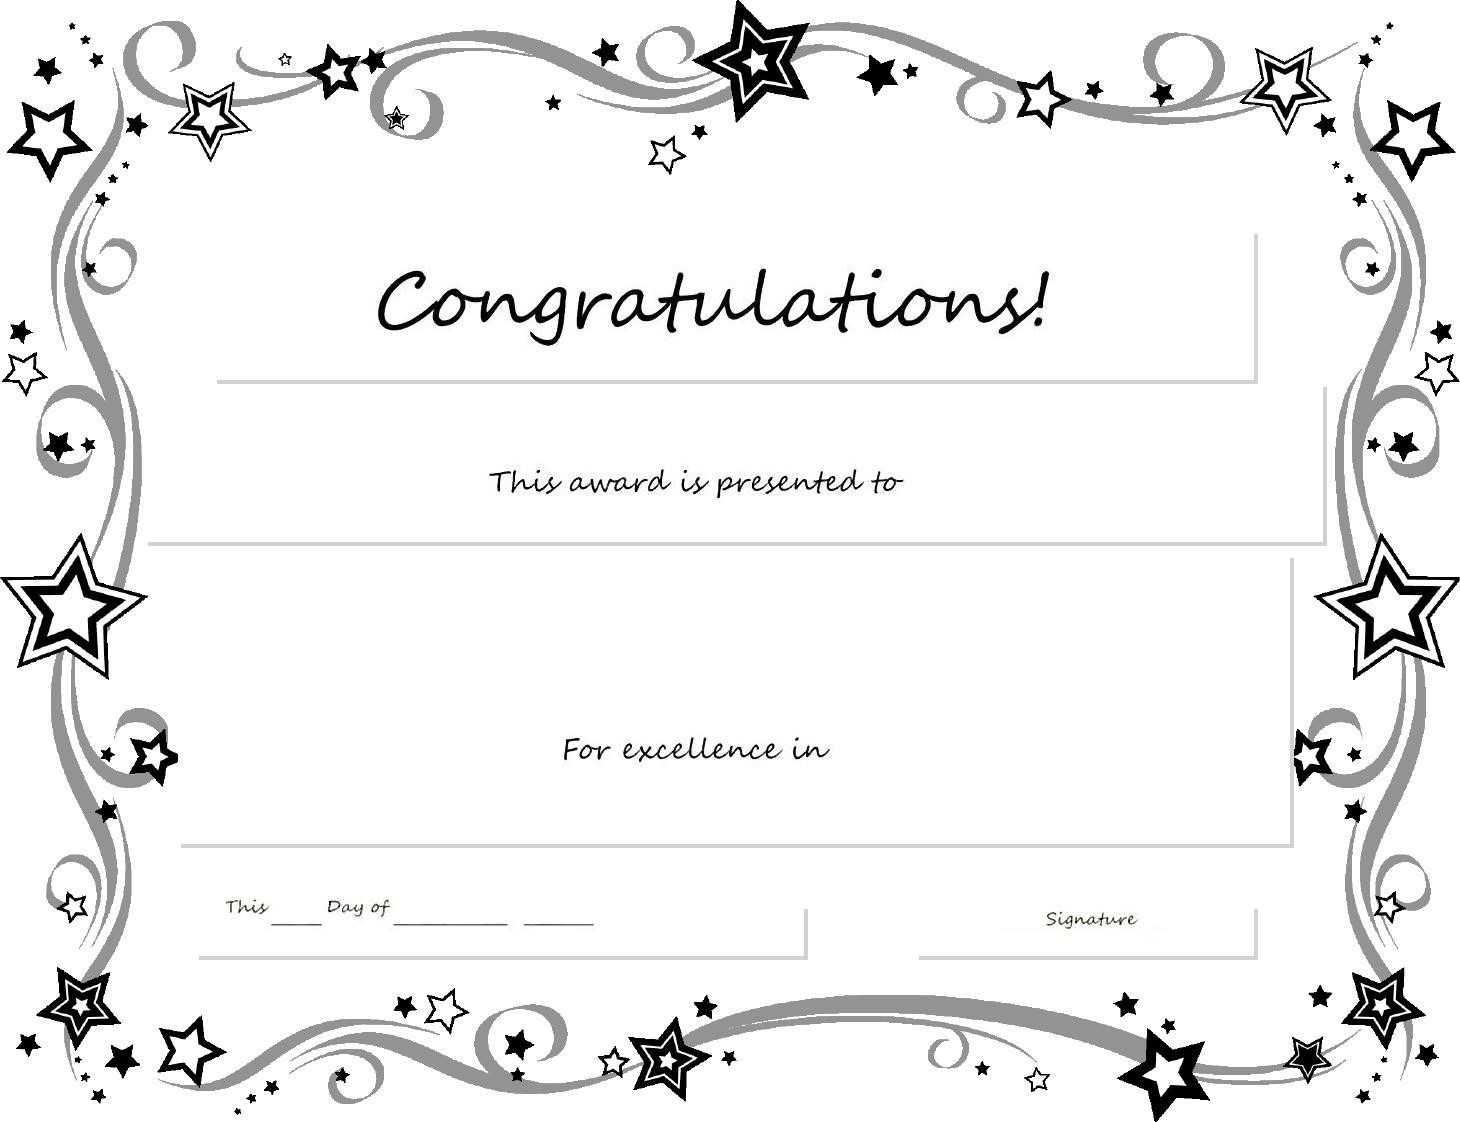 Congratulations Certificate Word Template - Erieairfair With For Congratulations Certificate Word Template